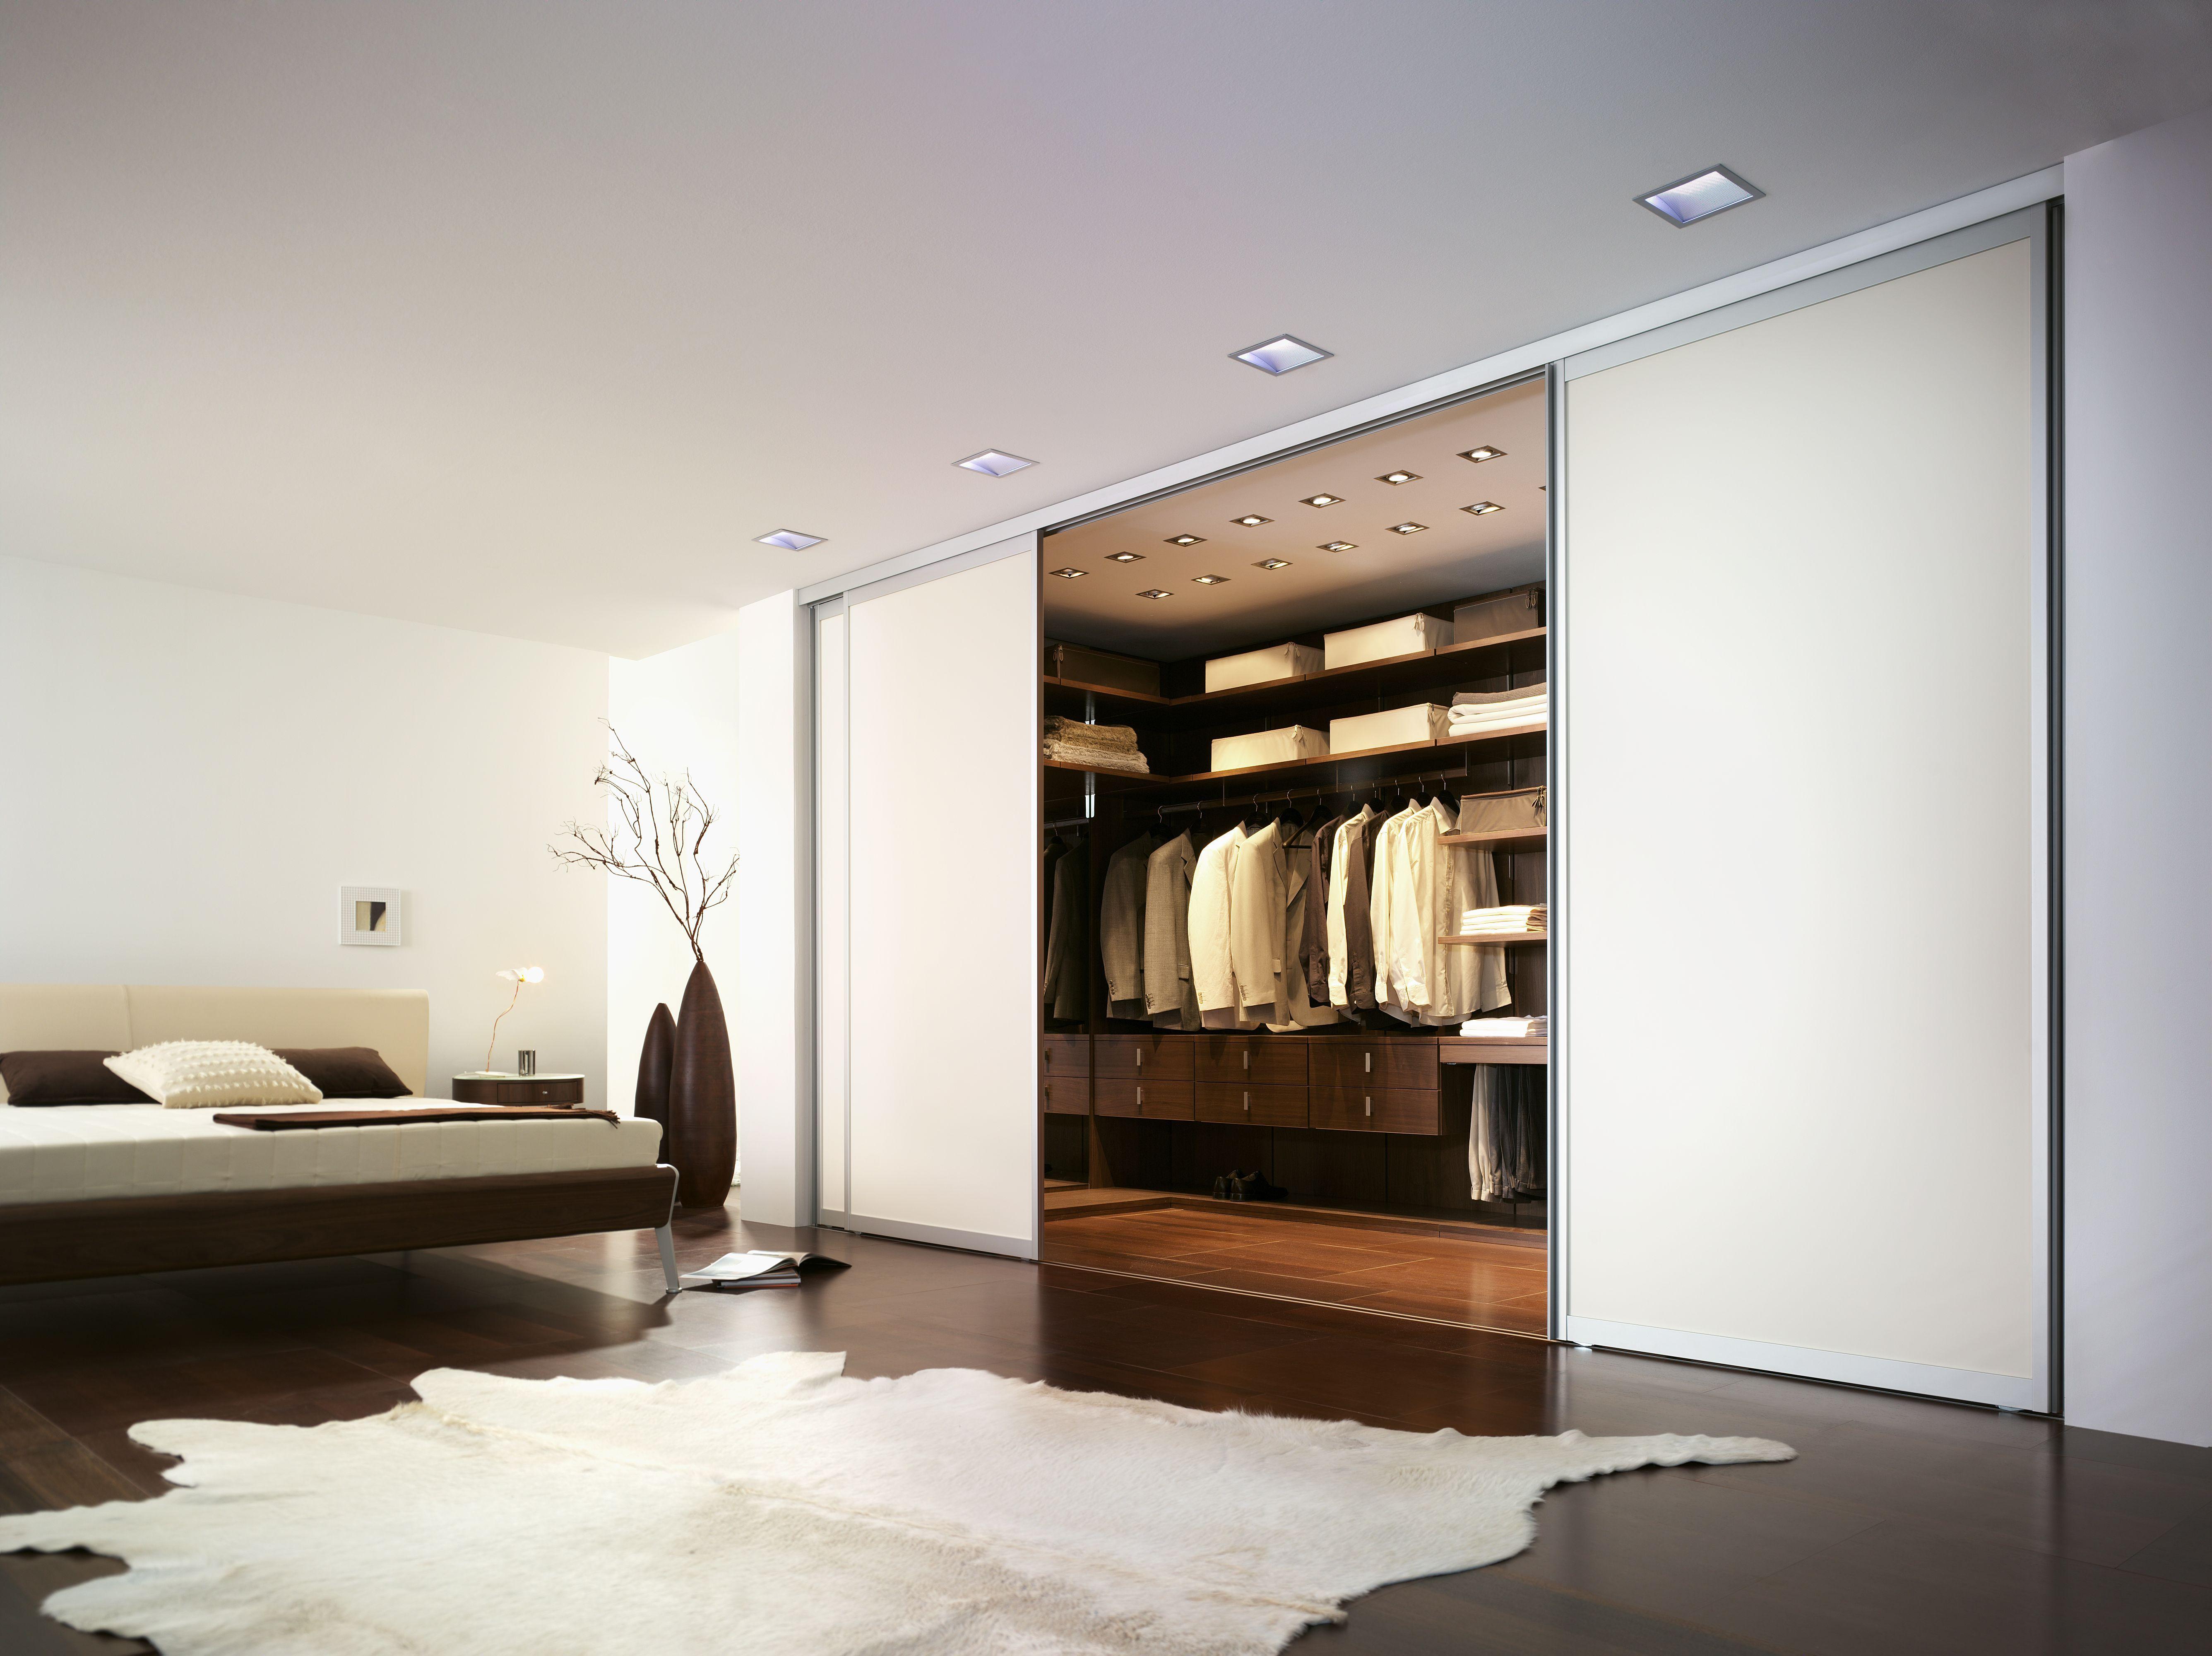 Simply amazing. The \'Space System\' walk-in wardrobe by Wackenhut ...